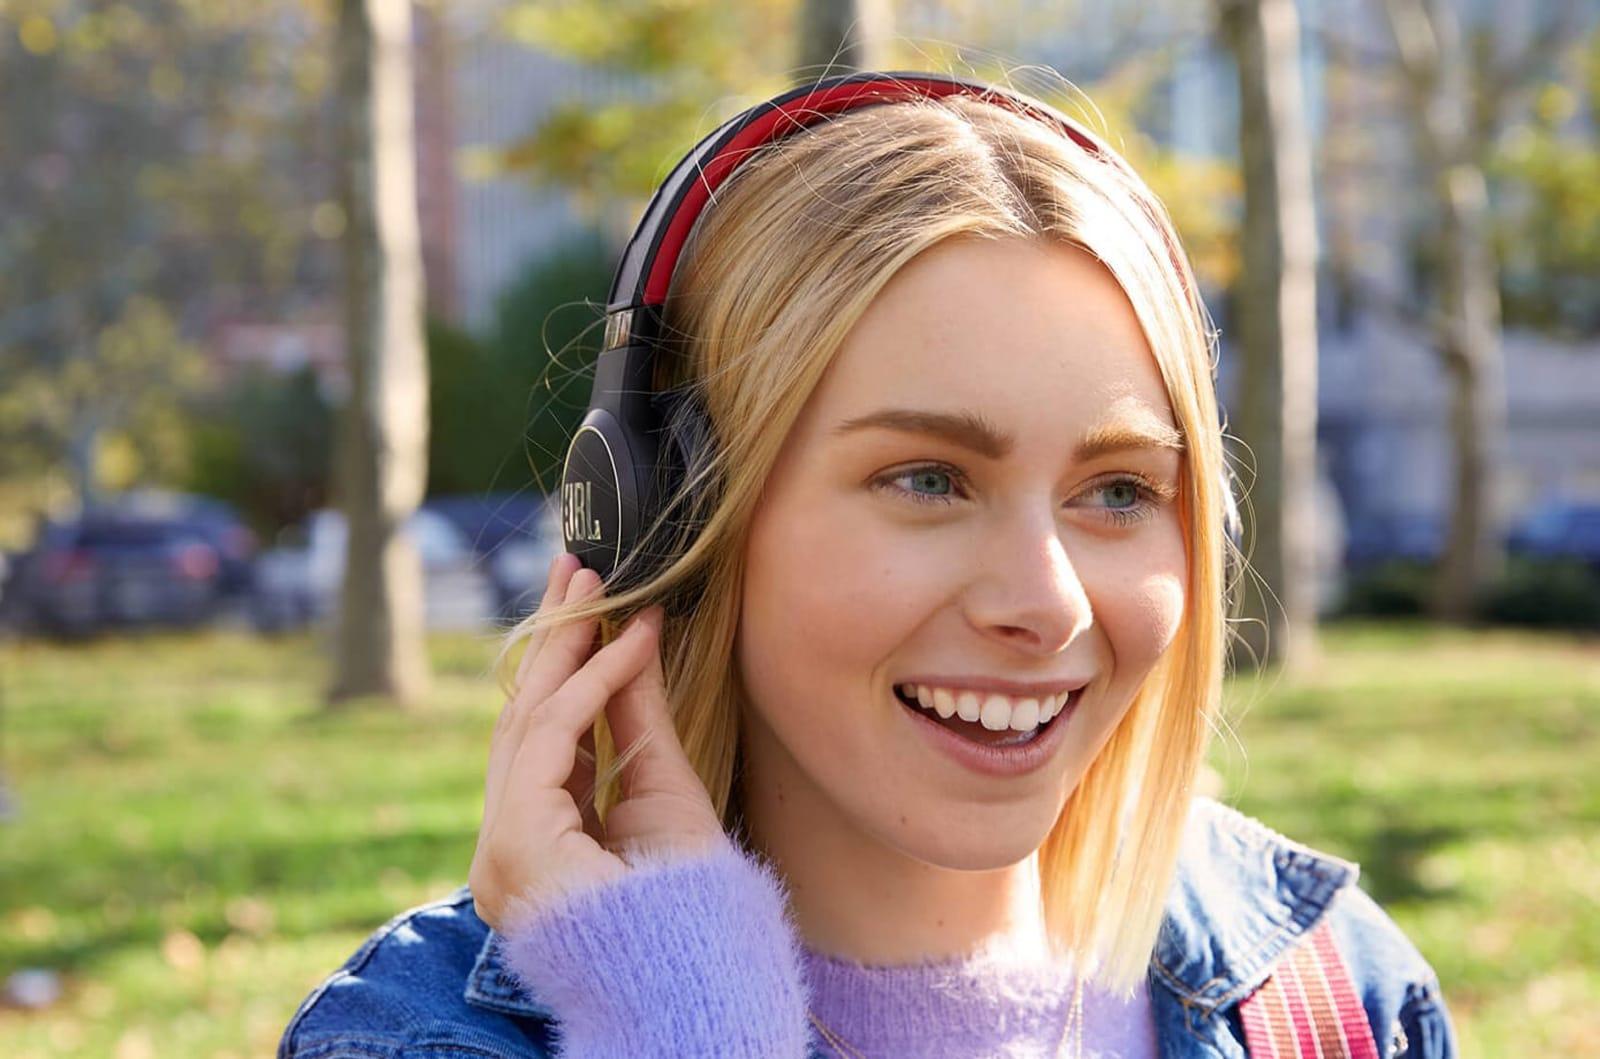 JBL says its solar powered headphones deliver 'unlimited